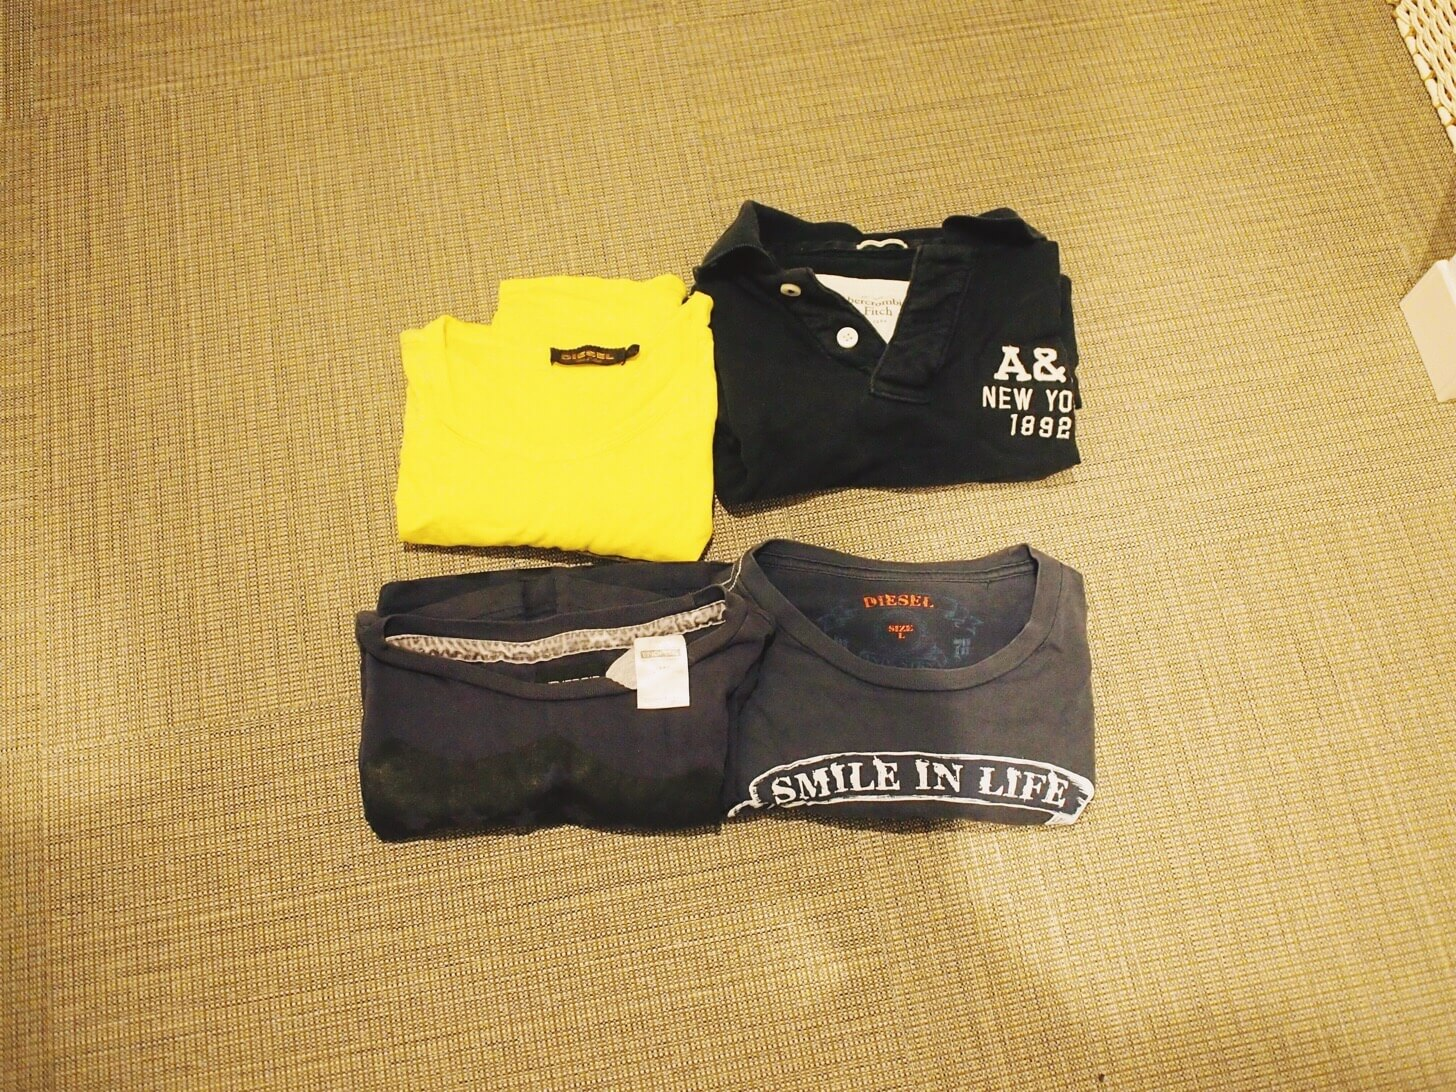 Tシャツ・ポロシャツの断捨離-4